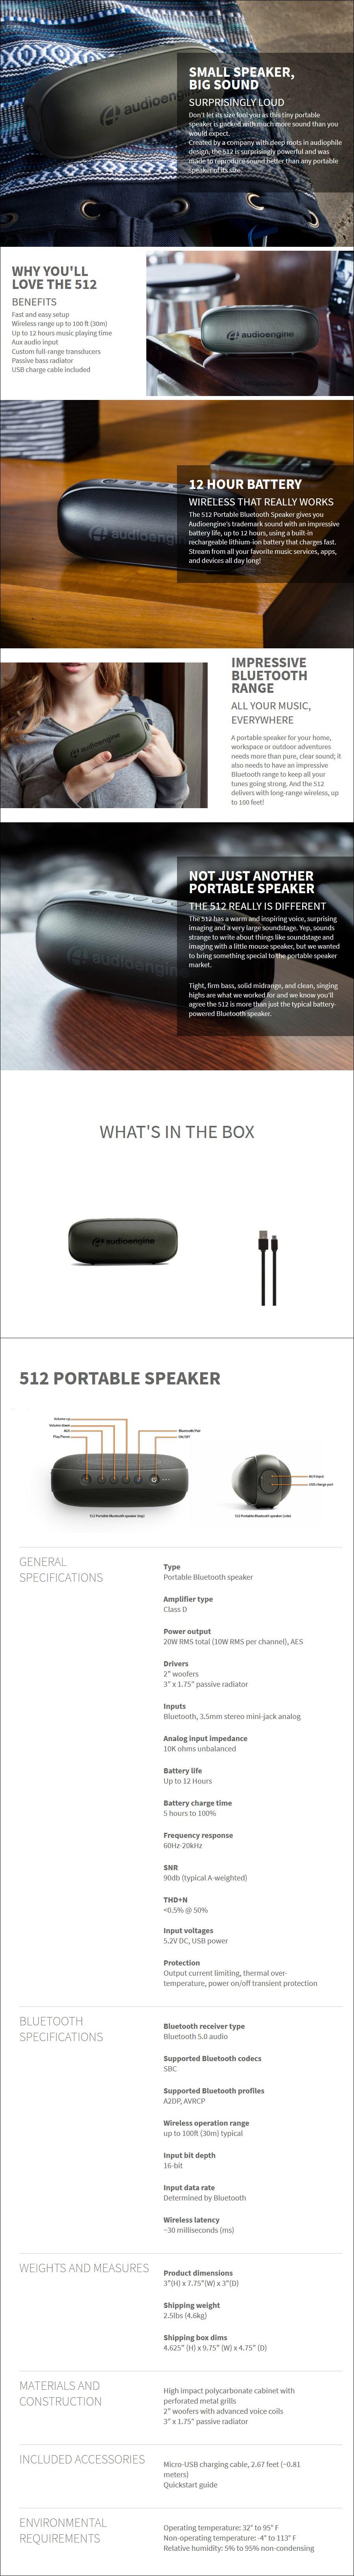 Audioengine 512 Portable Bluetooth Speaker - Black - Desktop Overview 1